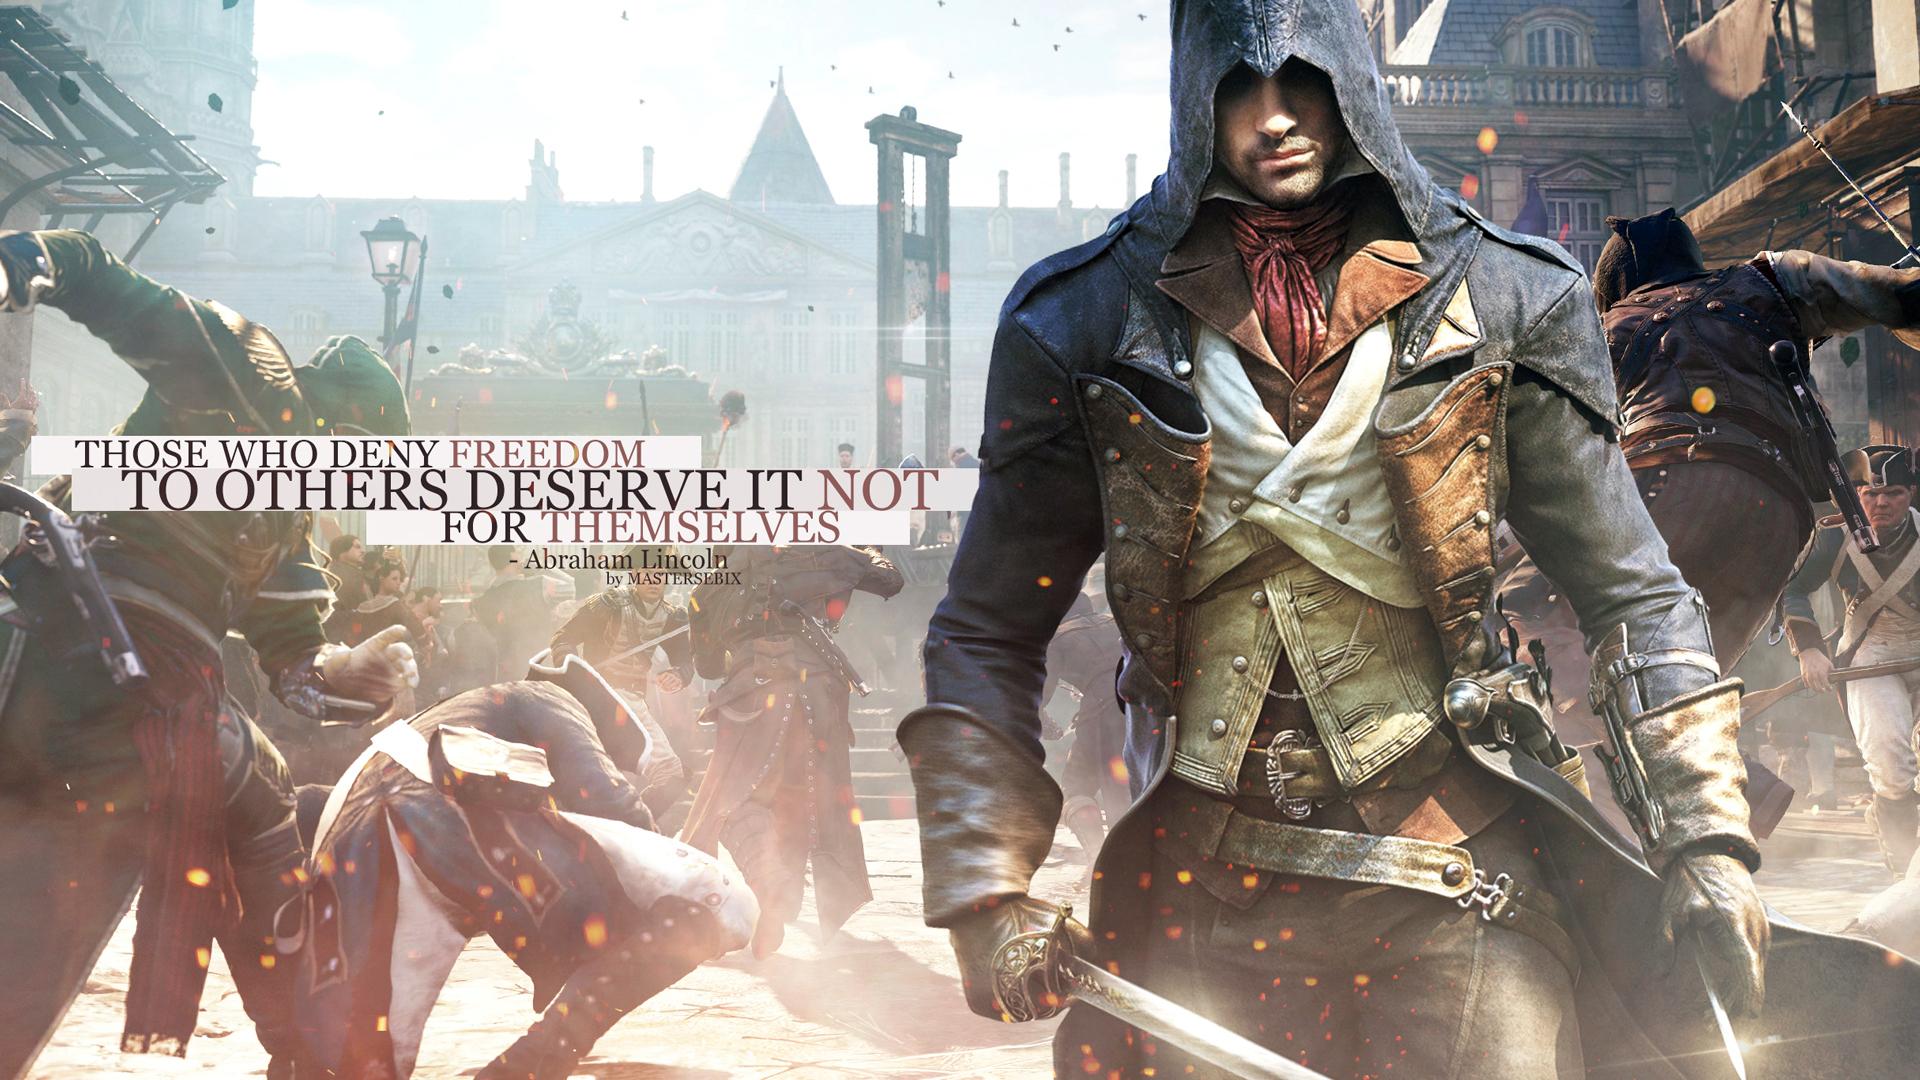 Assassins Creed Unity Arno Dorian action 1920x1080